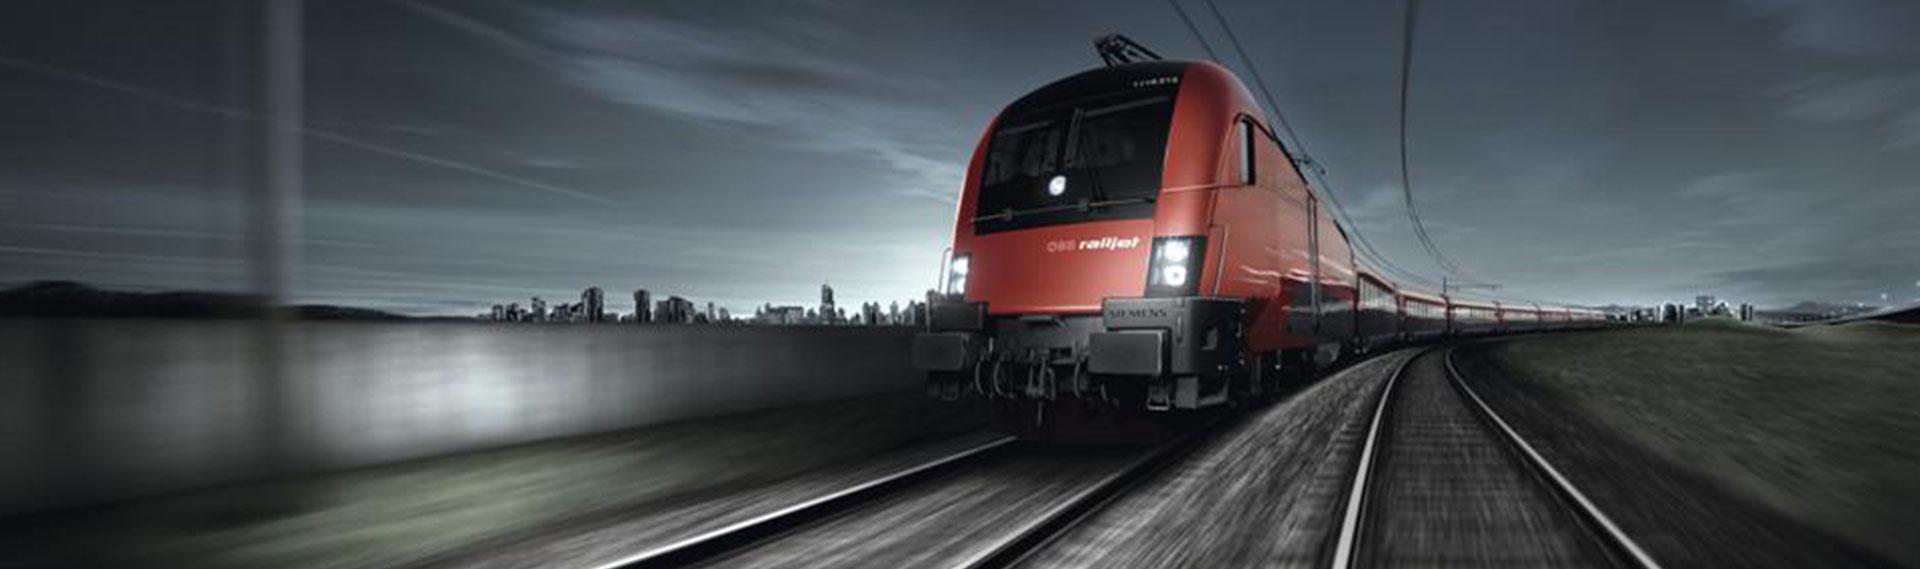 OBB-railjet-credit-Railteam